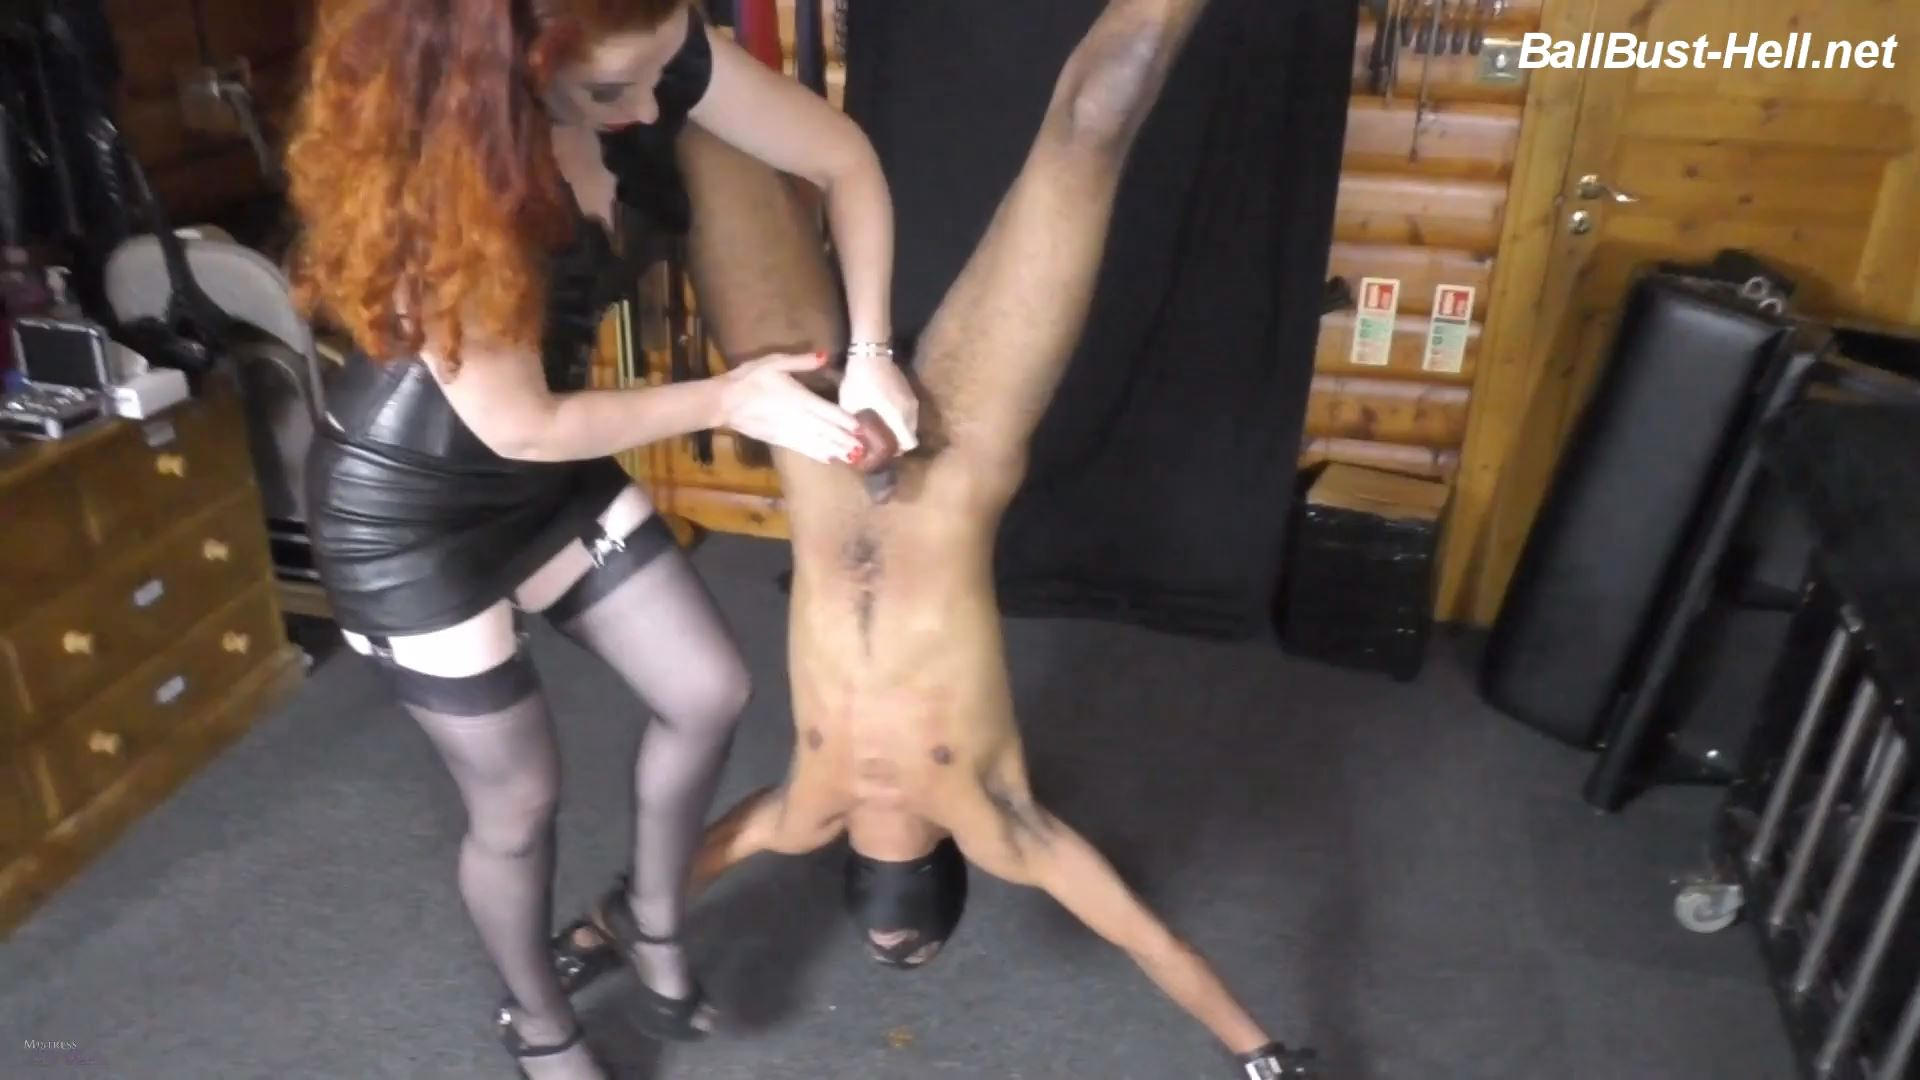 Mistress Lady Renee In Scene: Squishy suspension - MistressLadyRenee - FULL HD/1080p/MP4